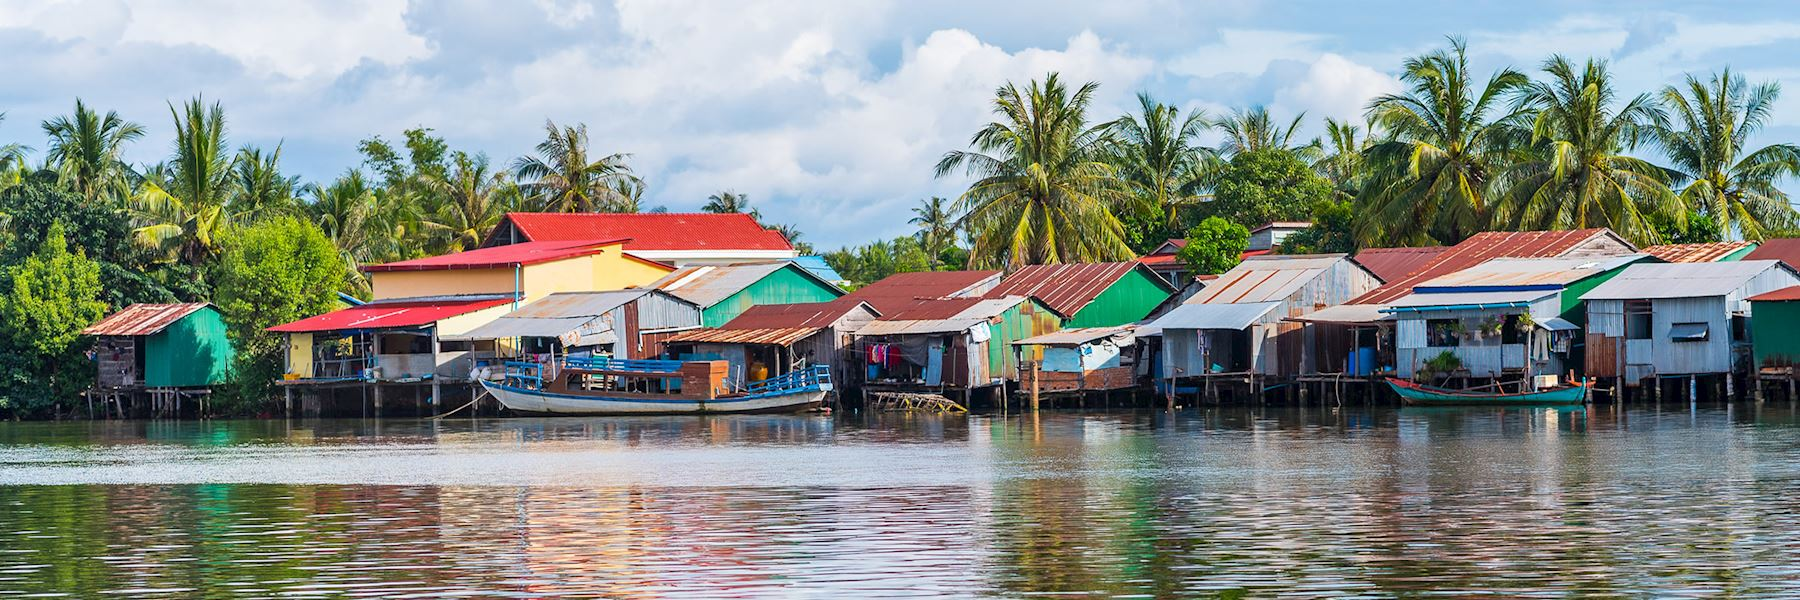 Visit Kampot, Cambodia